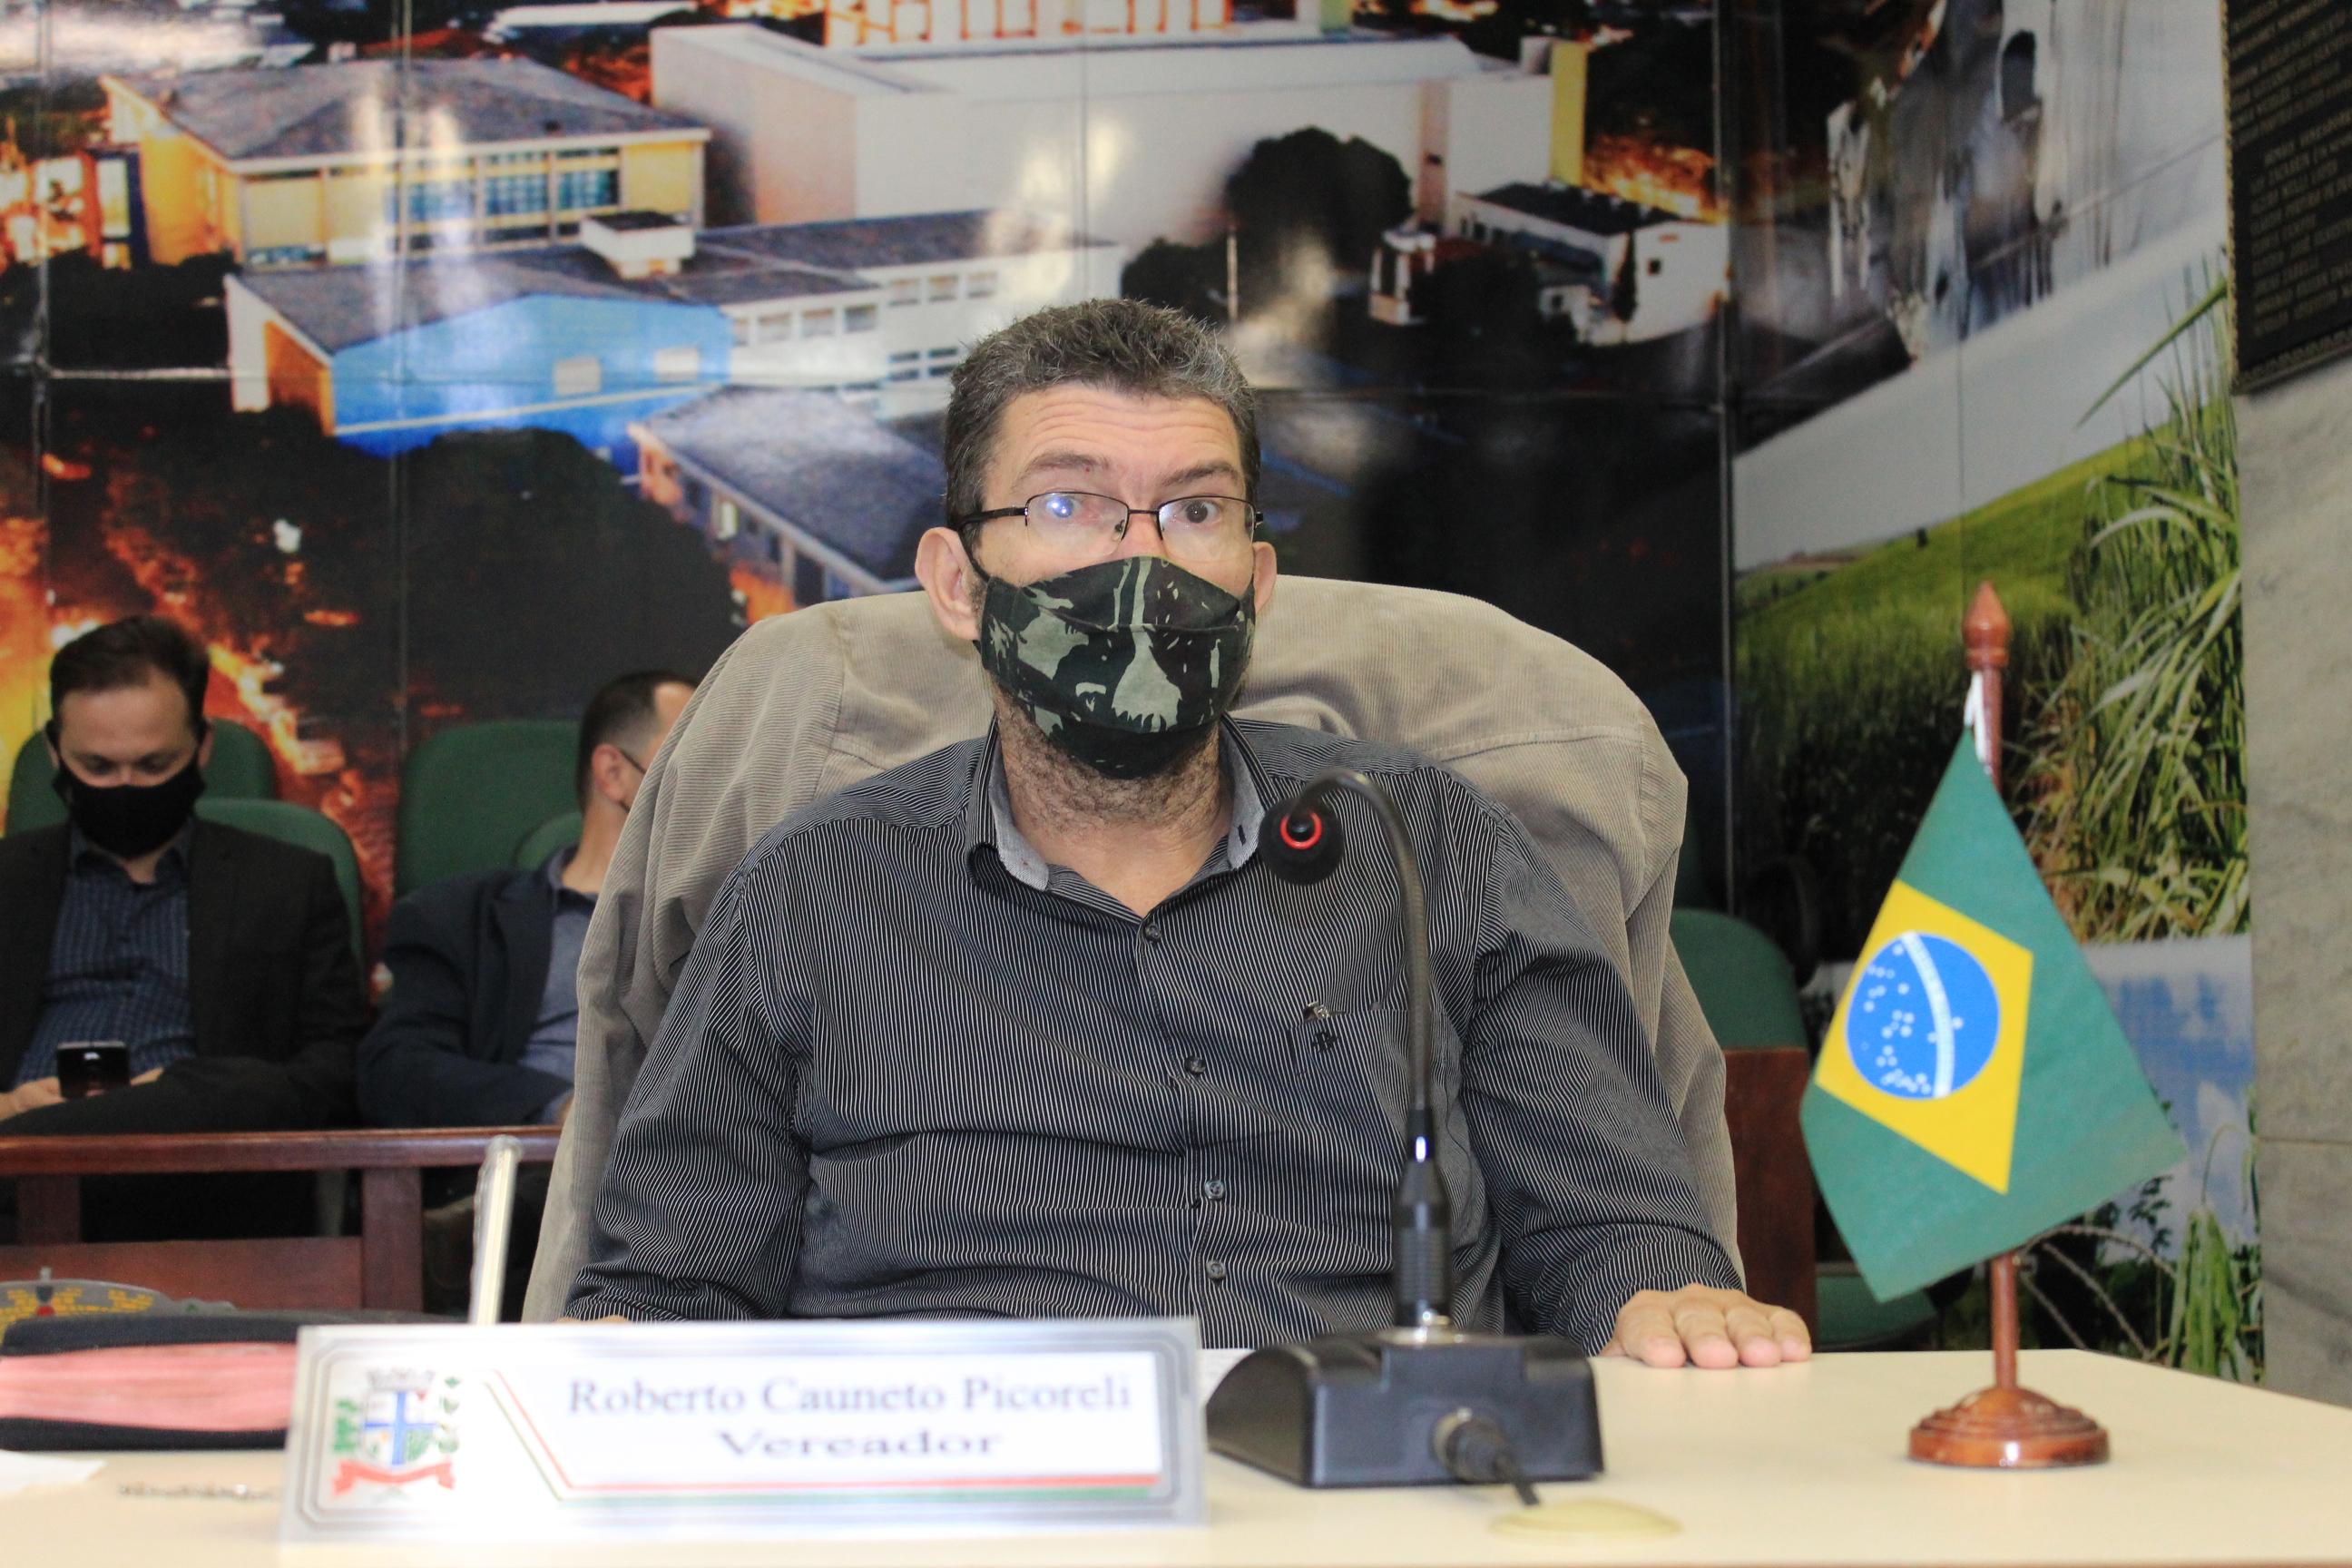 Vereadores solicitam suporte psicológico aos alunos durante pandemia